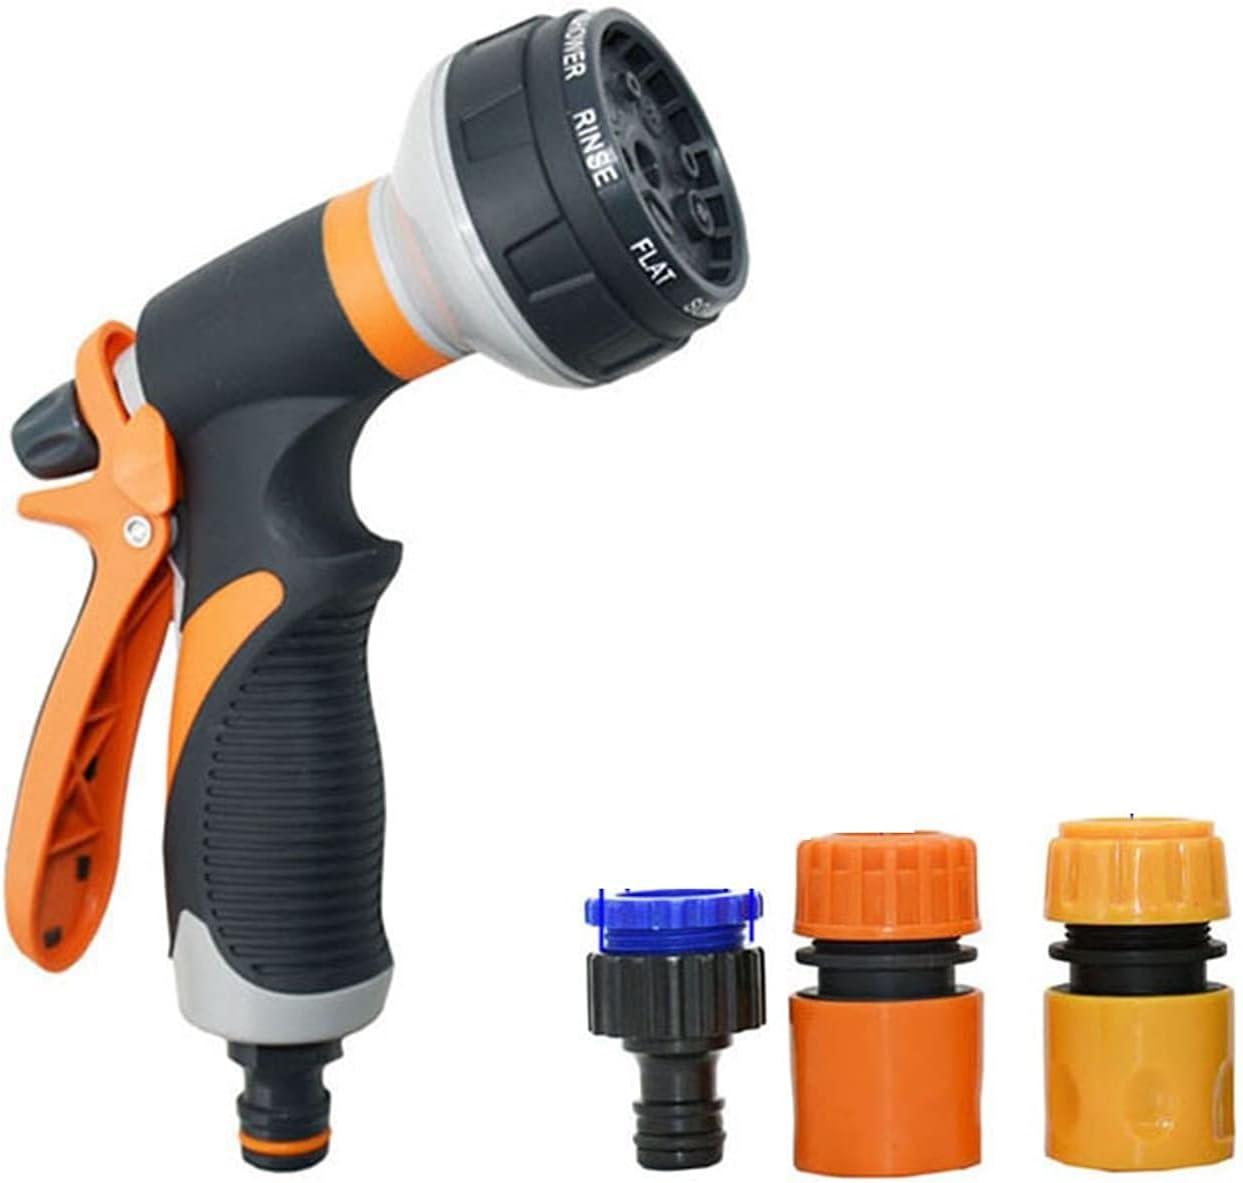 LOVCCIE Hose Max 69% OFF Pipe Spray Multi-Fu Omaha Mall Adjustable Gun